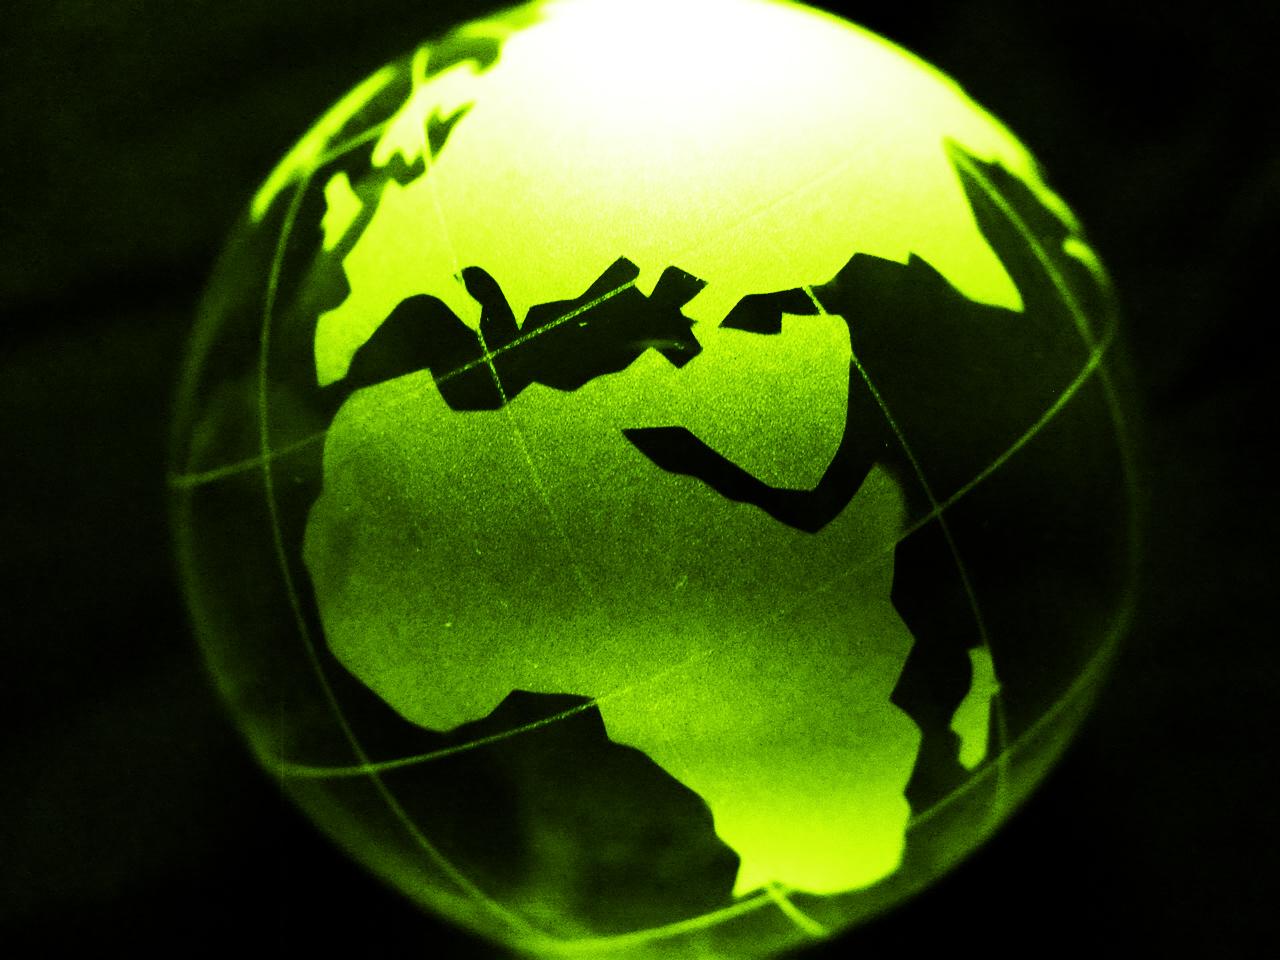 kallman worldwide, ifat, awwa